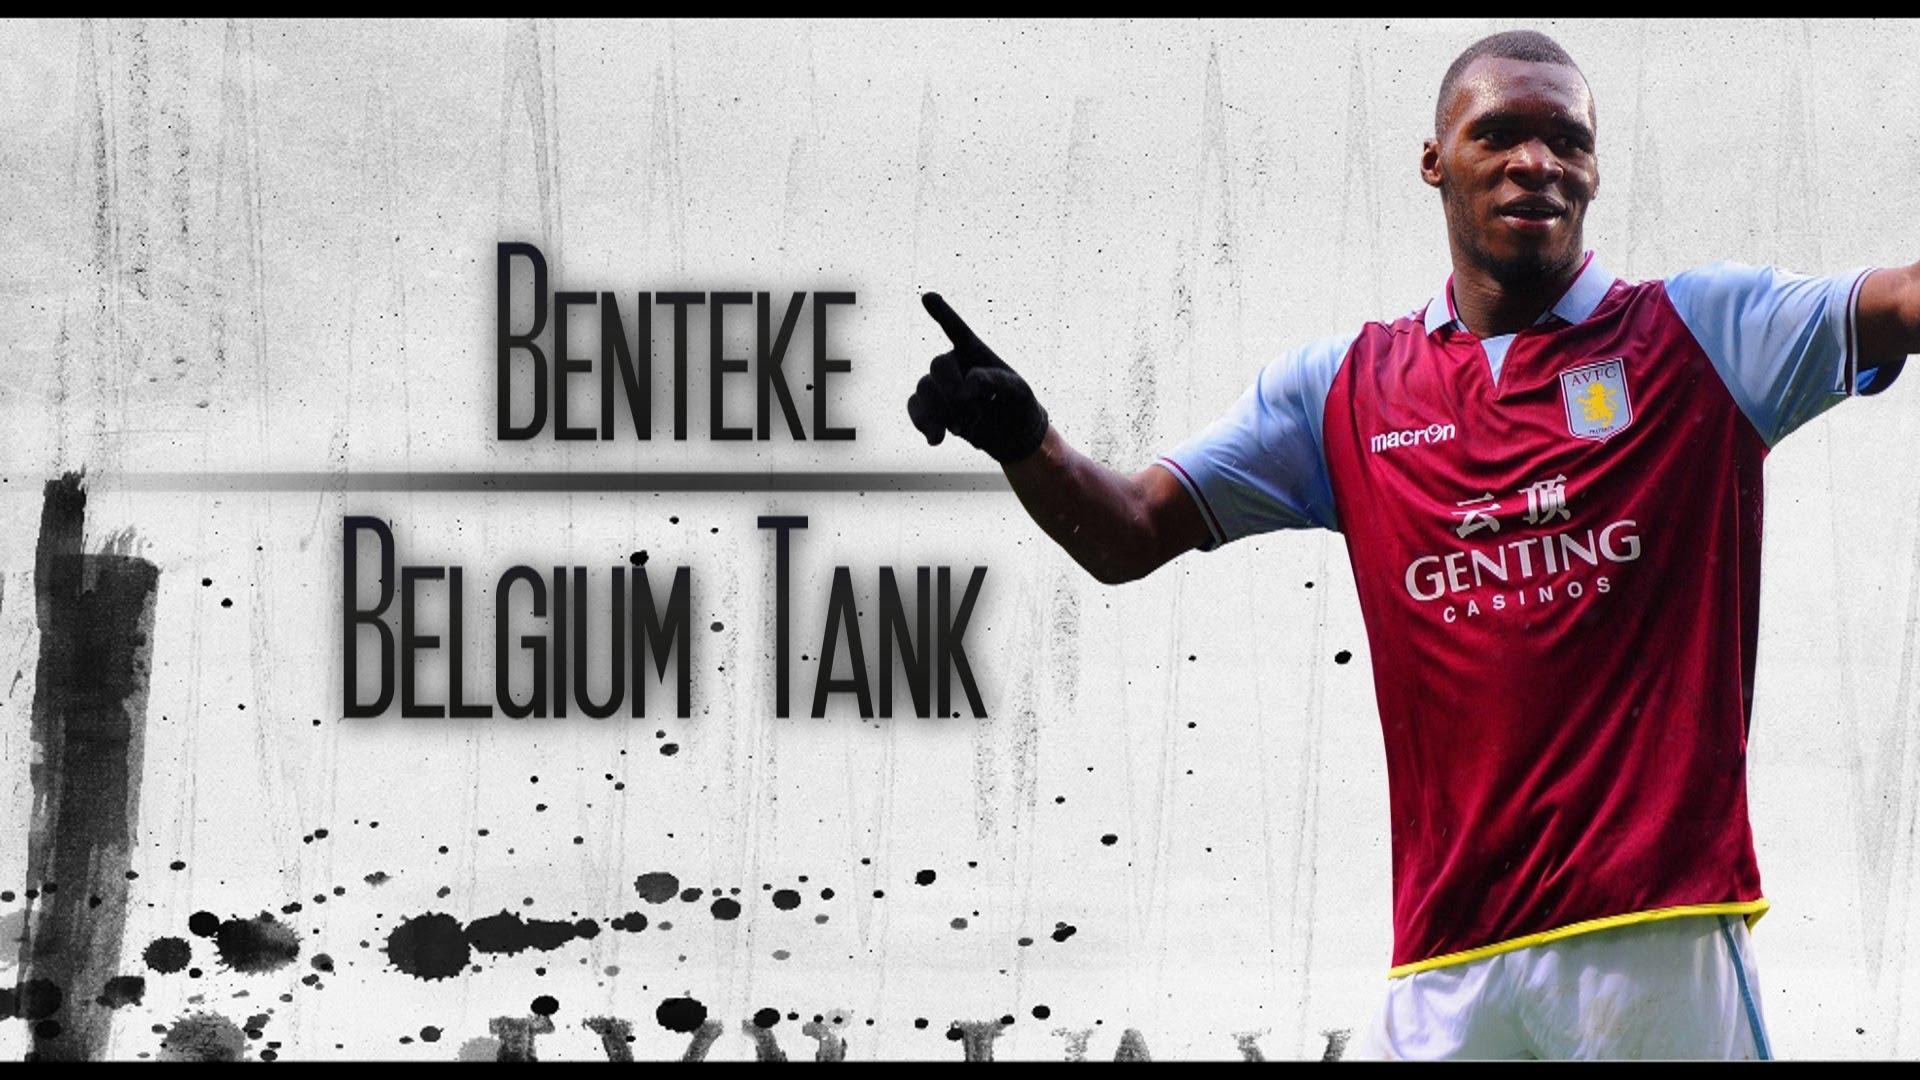 Christian Benteke Football Wallpaper 1920x1080